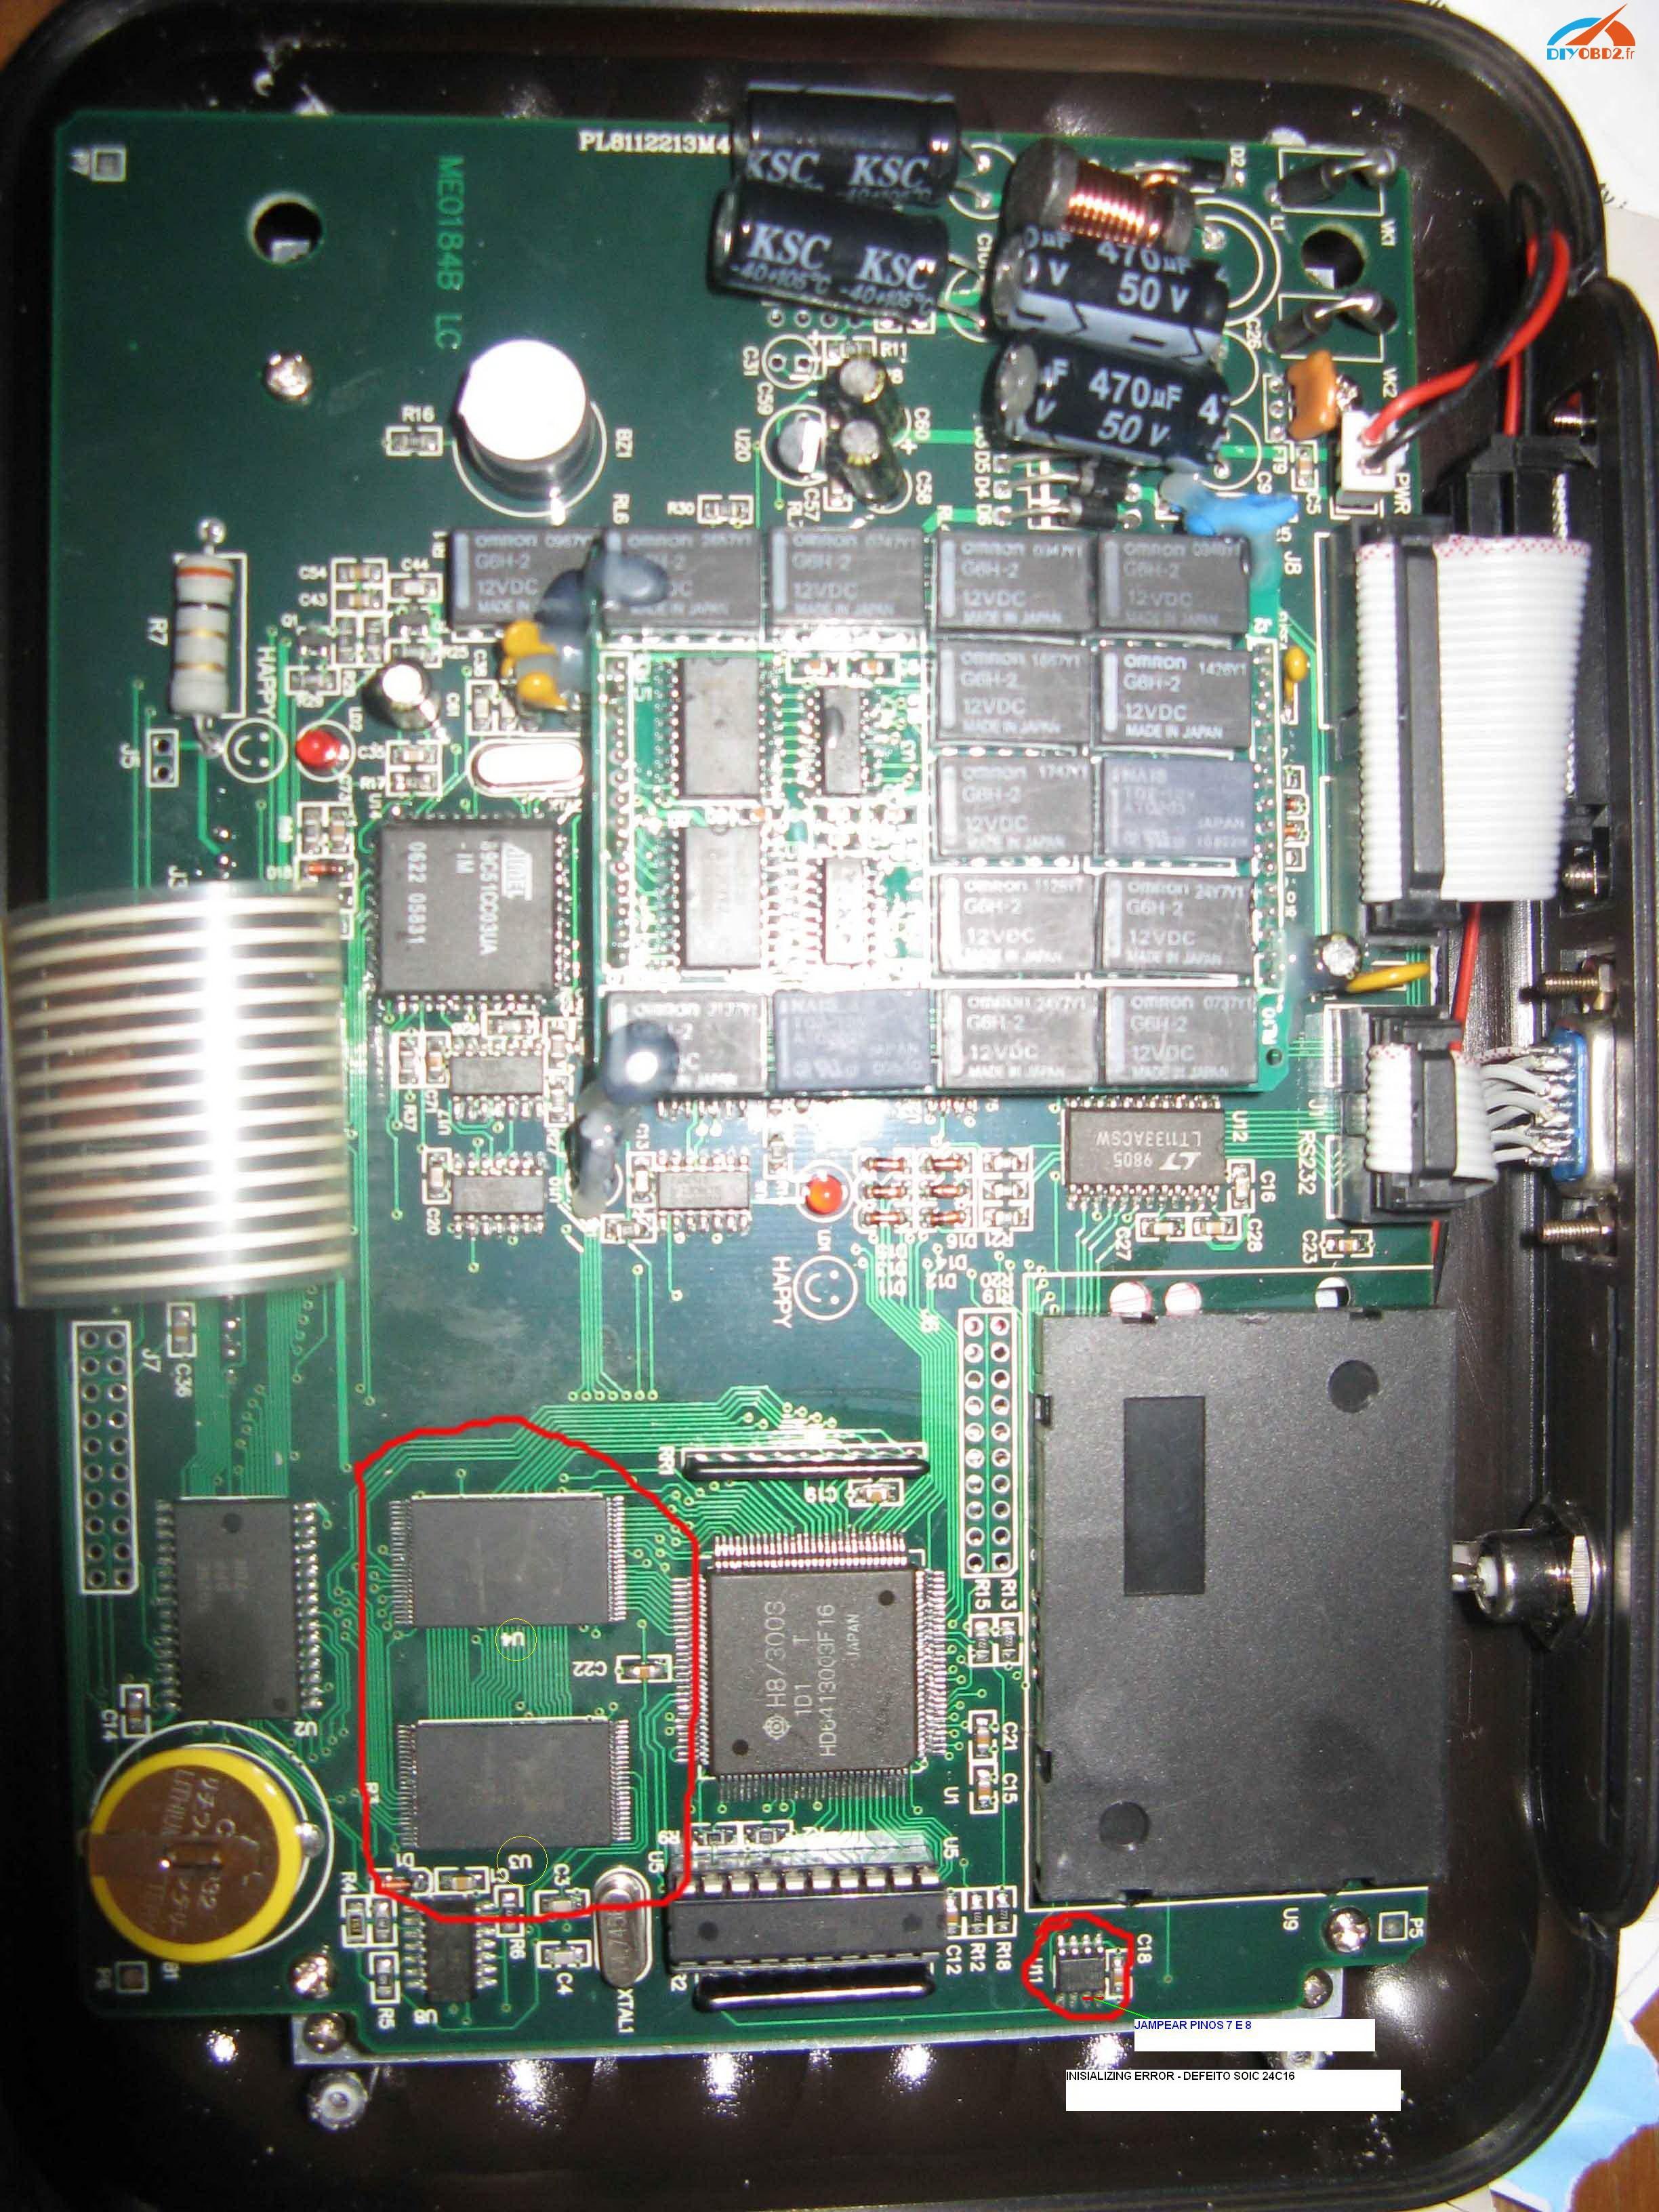 SBB-JAMPEAR-SOIC-24C16-PINOS-7-E-8